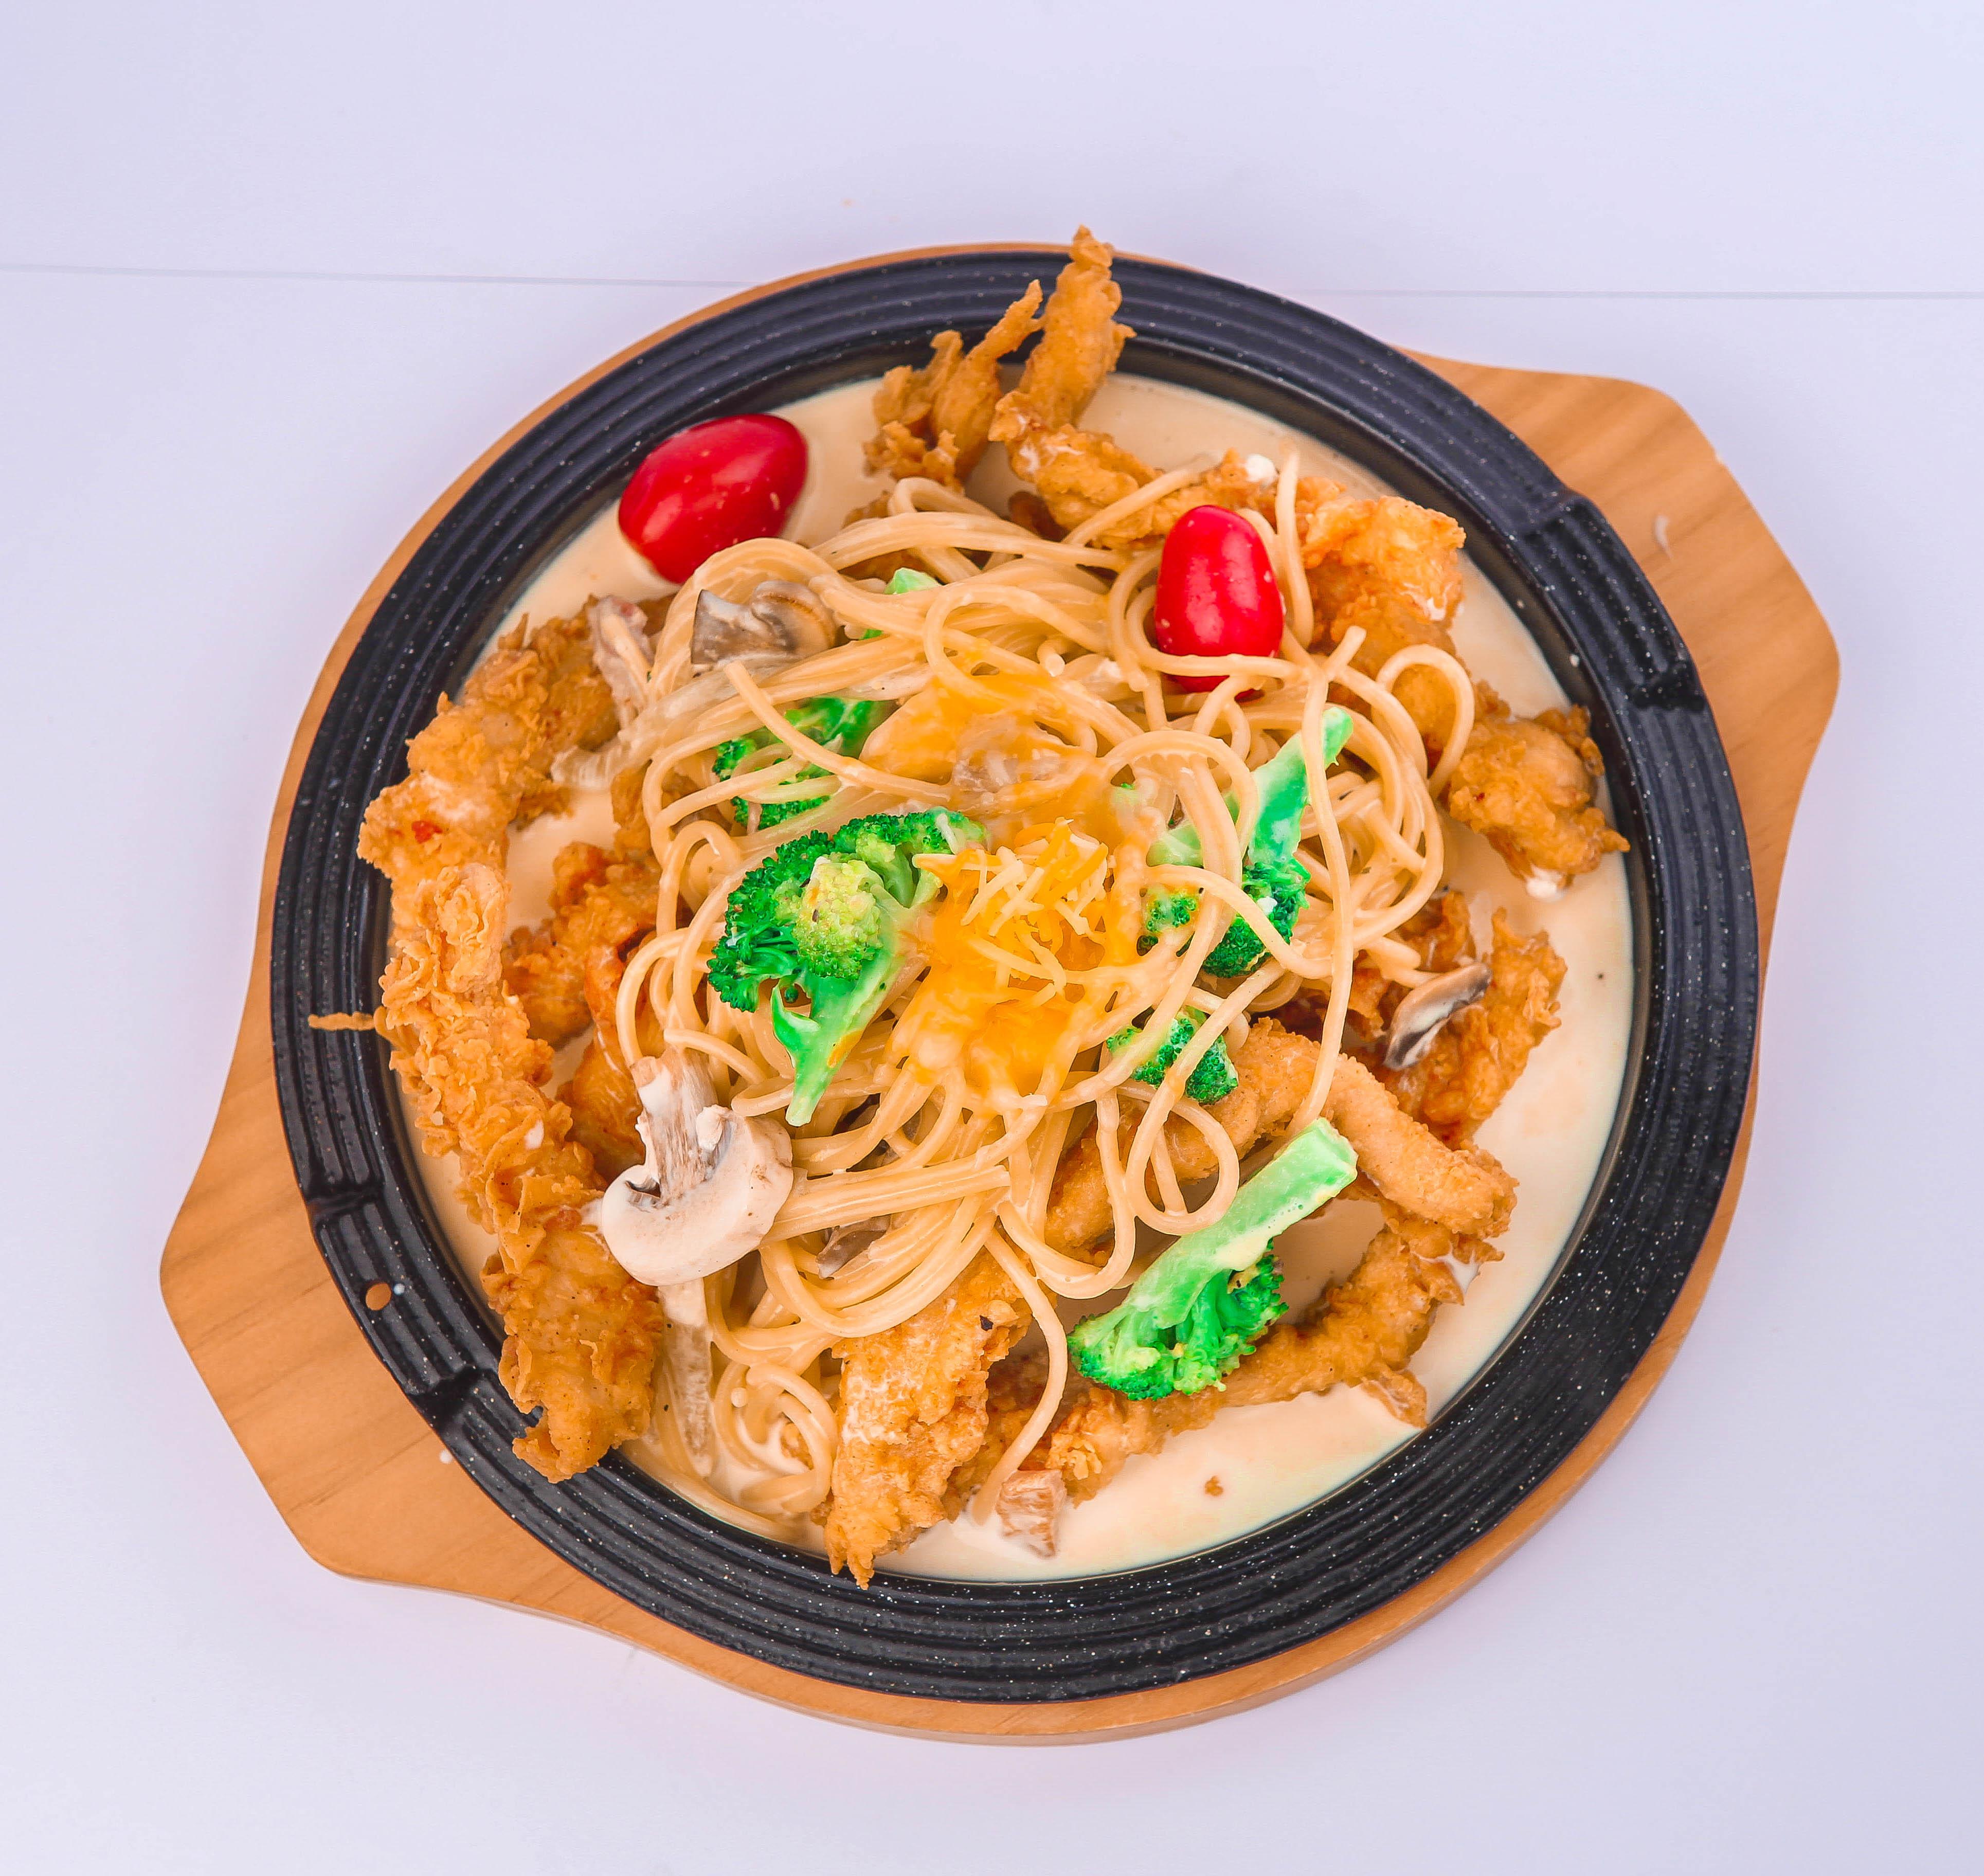 liquor-licensed-korean-restaurant-chinatown-300k-profit-to-owner-1